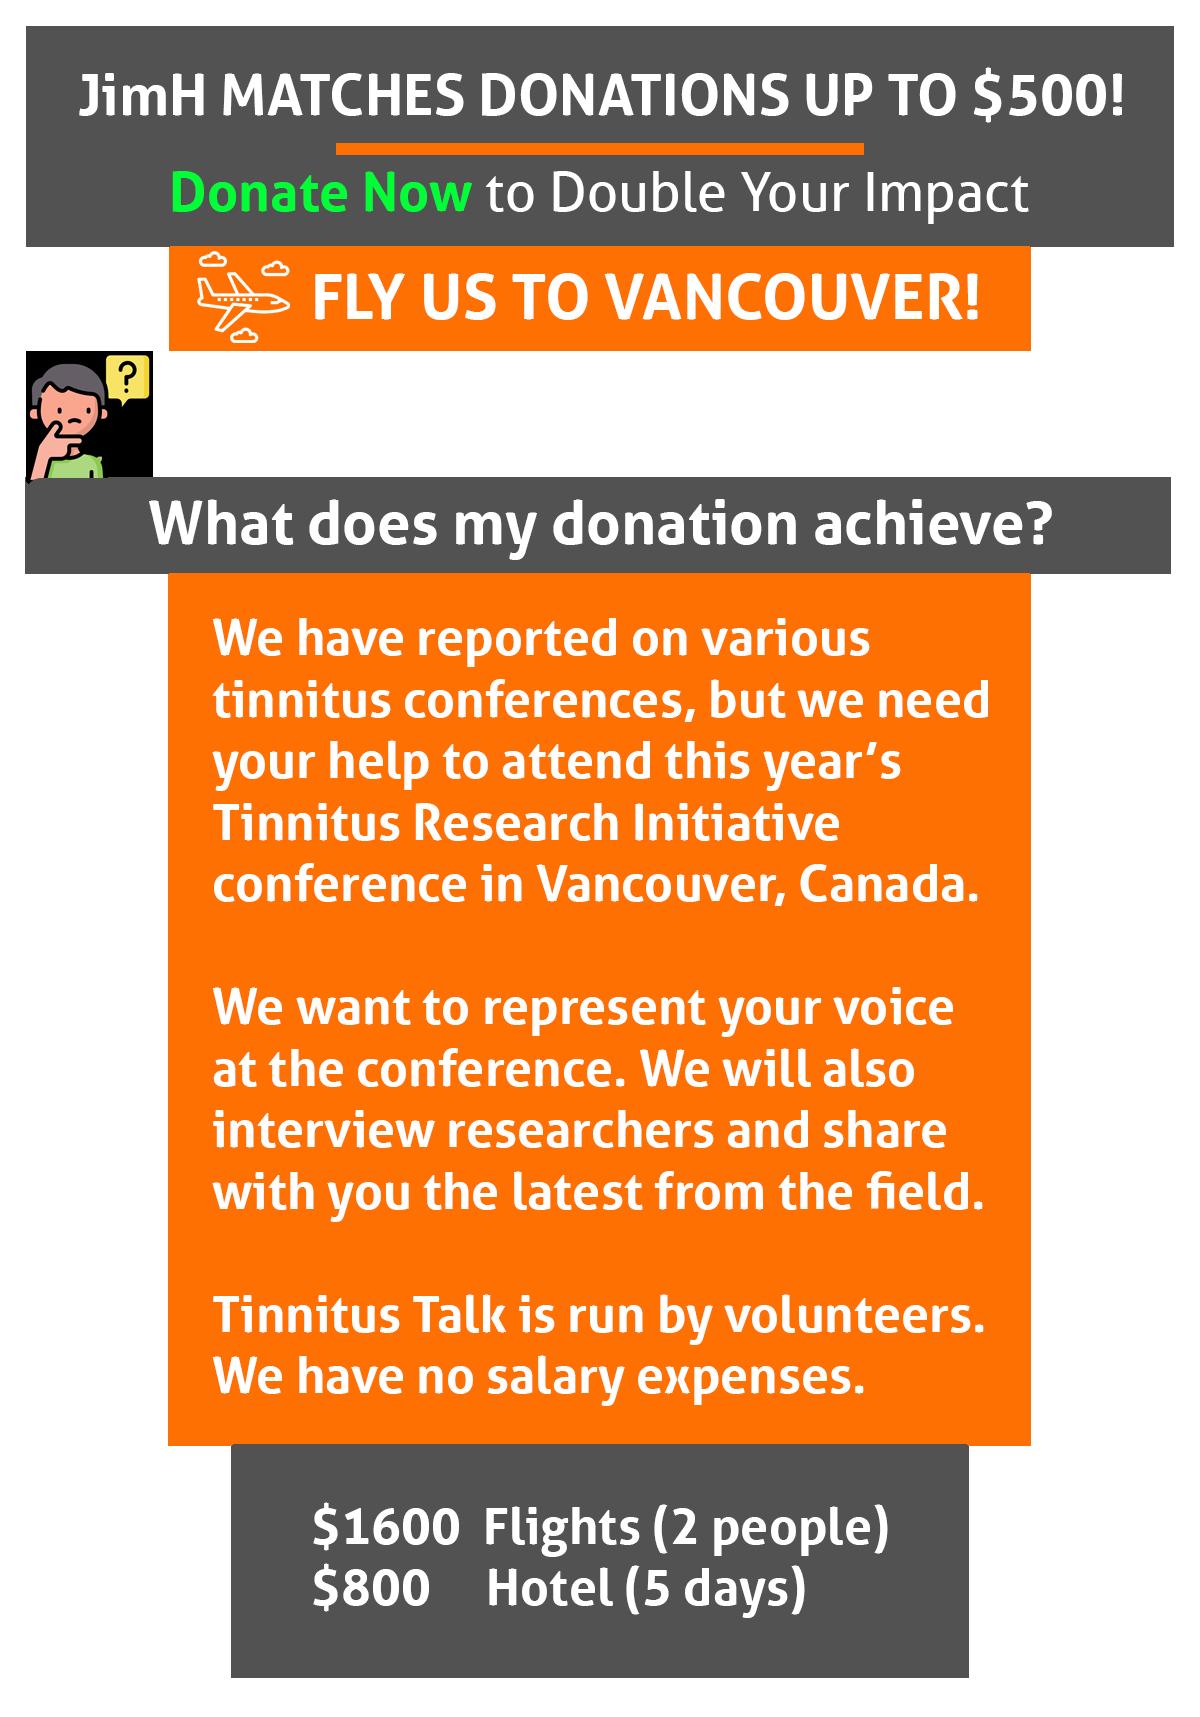 tinnitus-talk-jimh-fundraiser.png